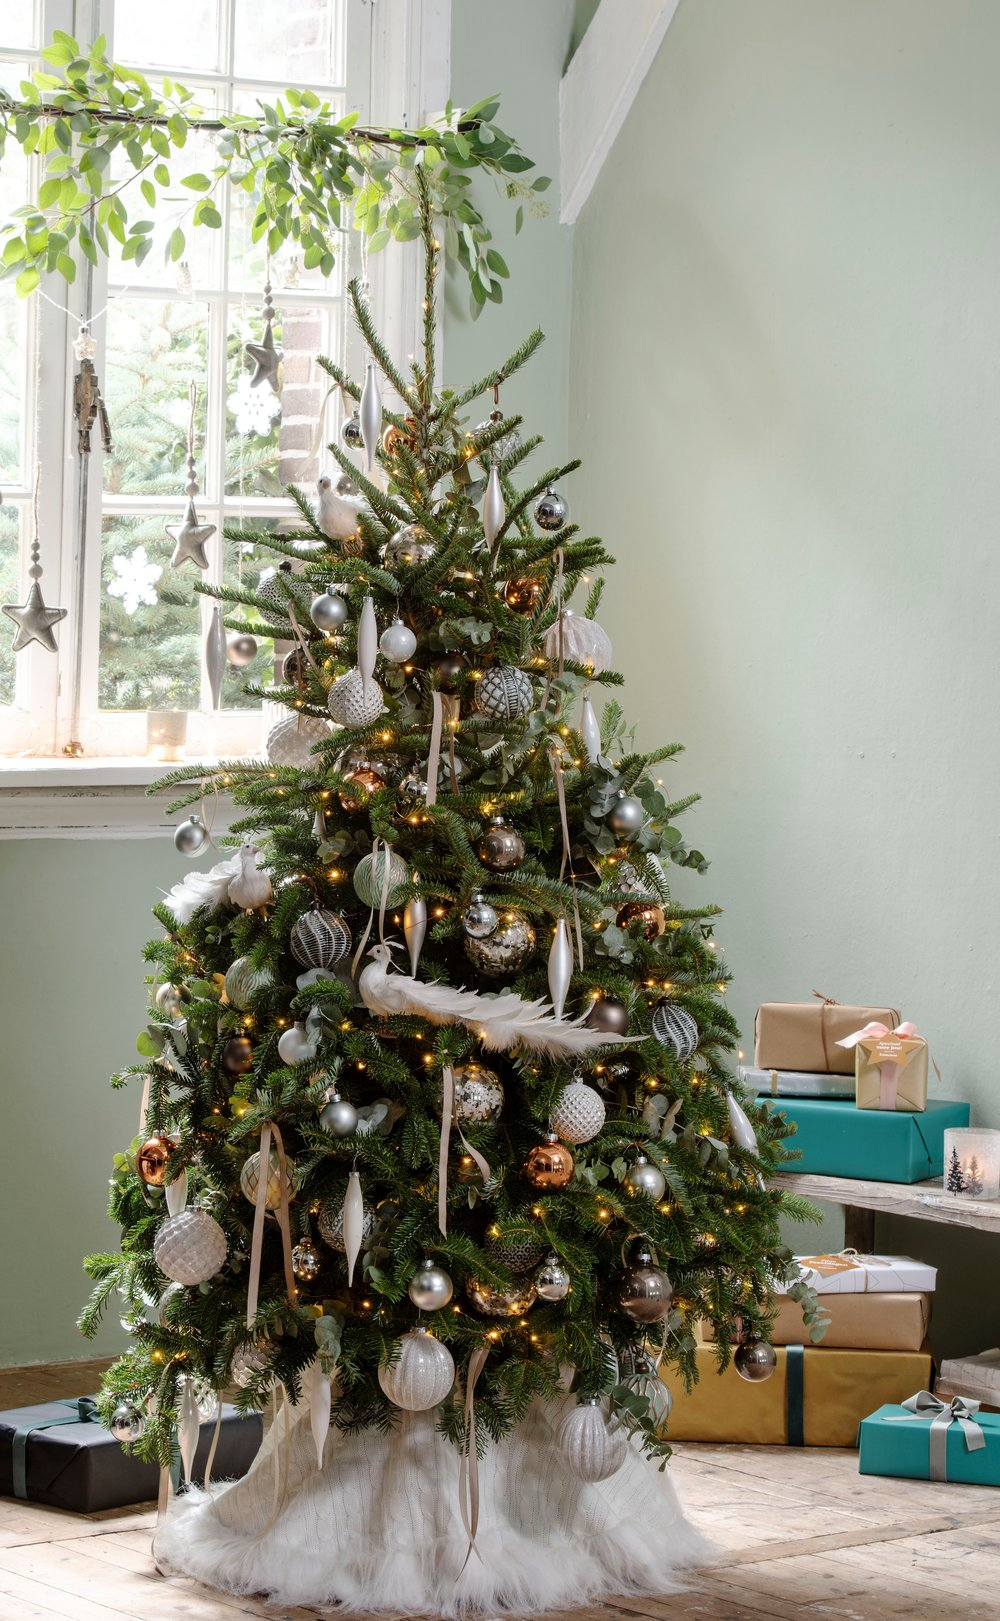 FROST DELIGHT_Intr kerst 2463 - Kek Mama.jpg